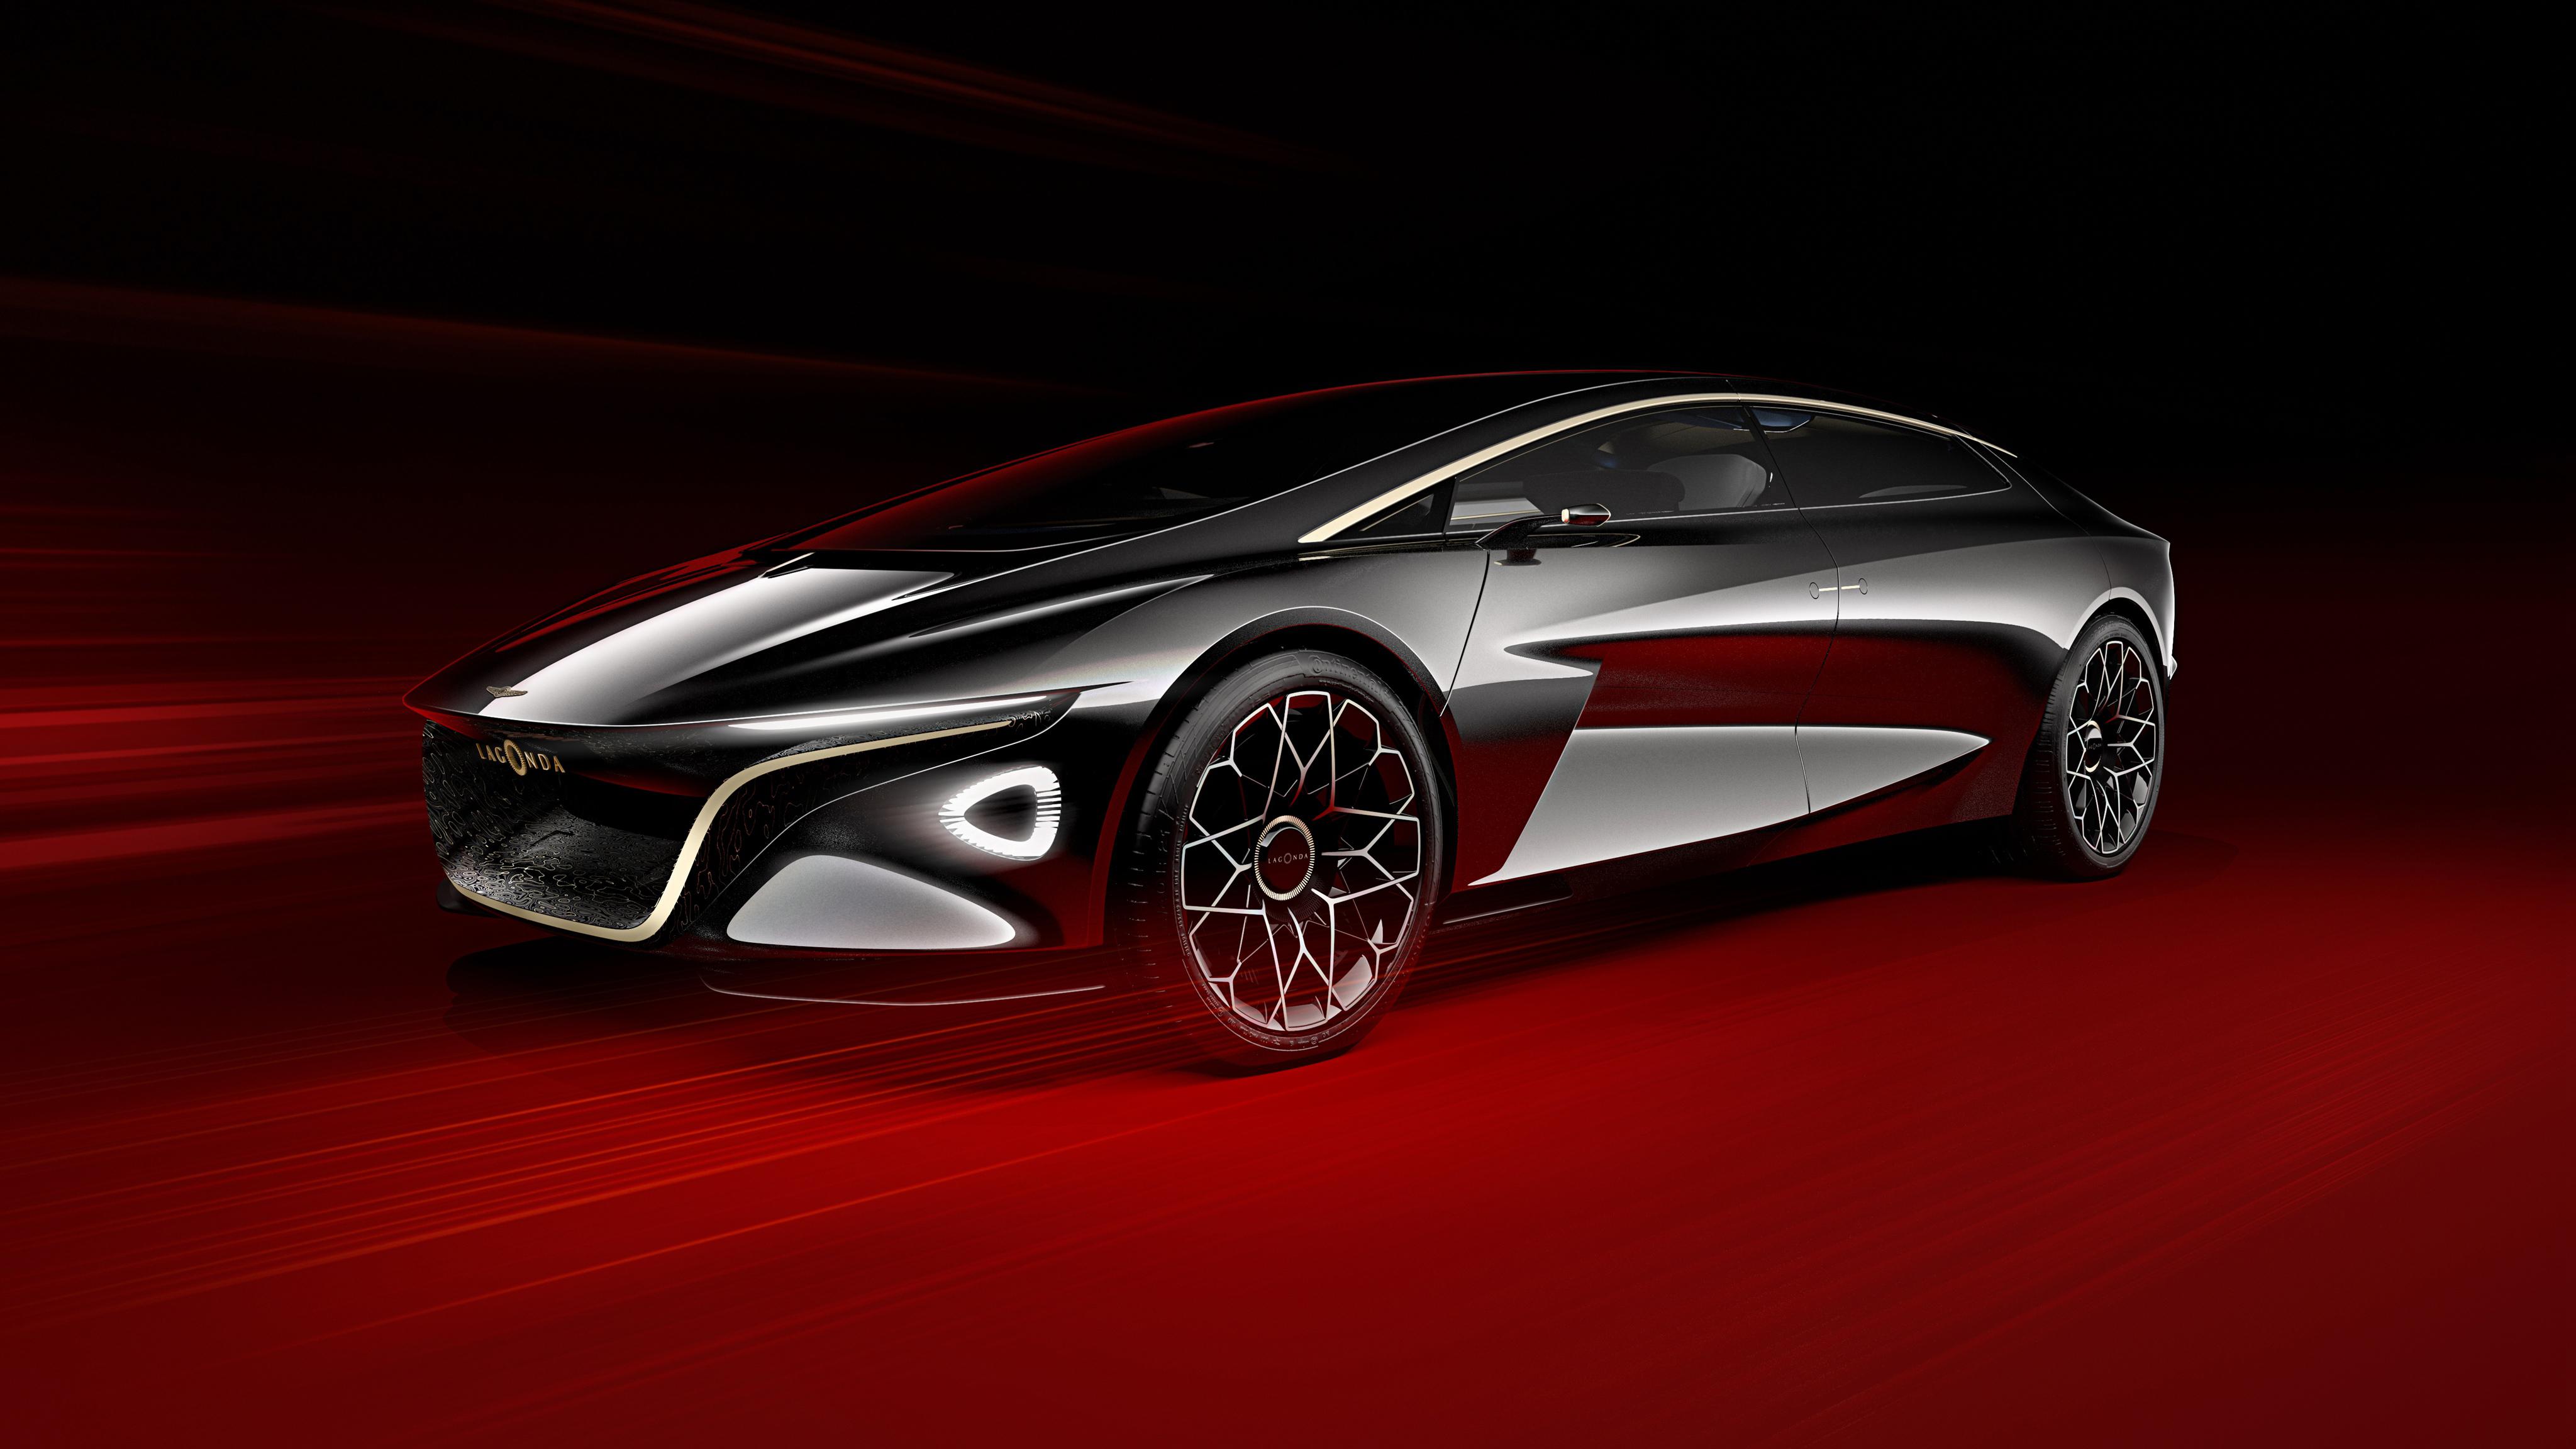 2018 Aston Martin Lagonda Vision Concept 4K 3 Wallpaper ...